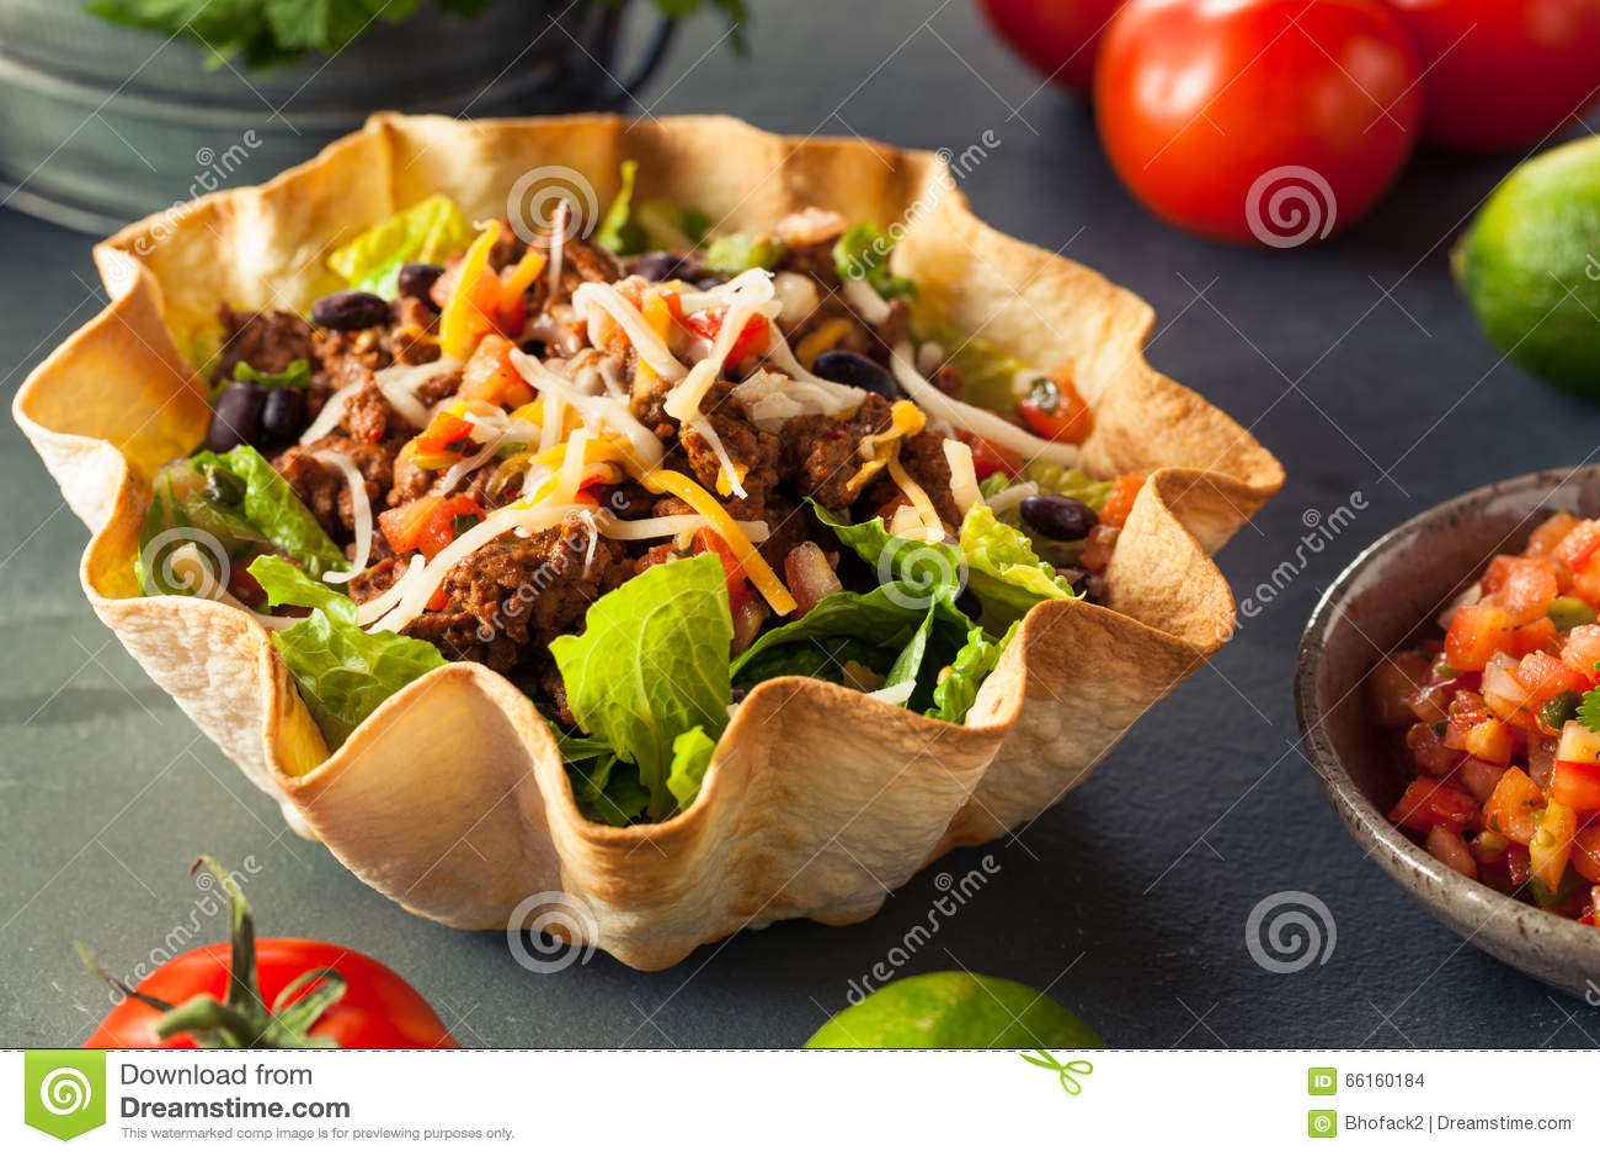 Taco Salad In A Tortilla Bowl Stock Photo - Image: 66160184